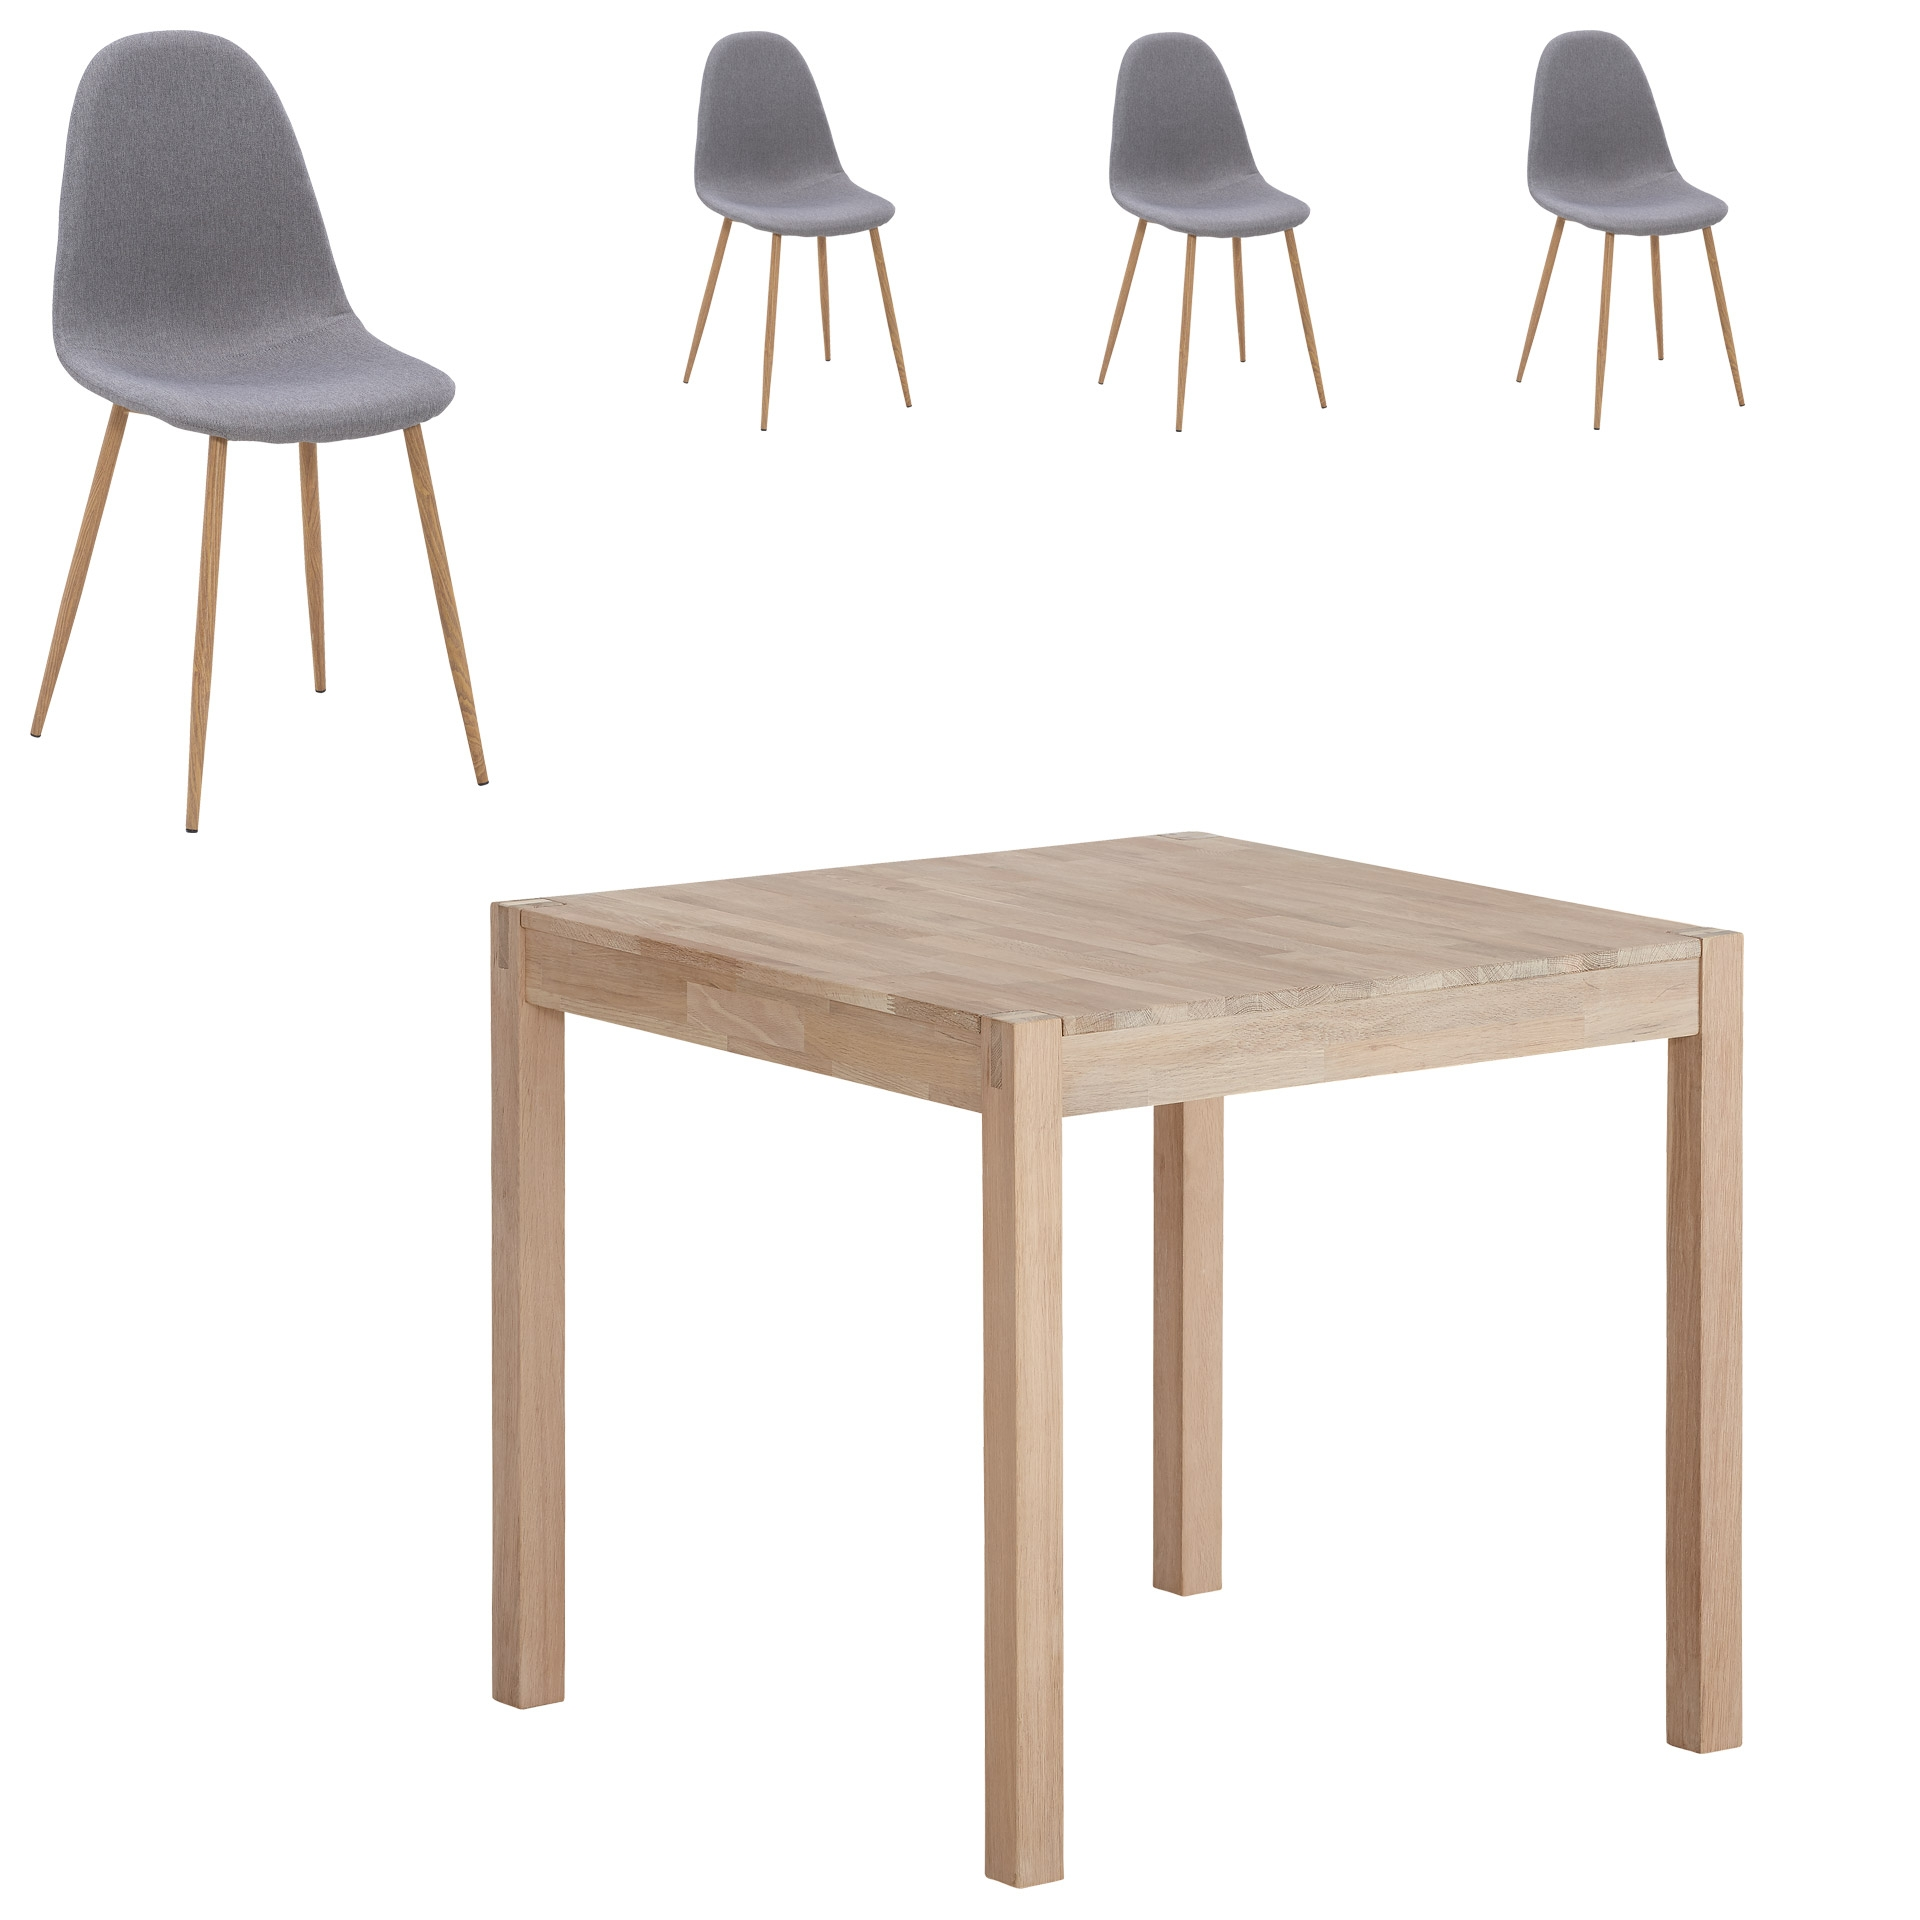 Essgruppe Ascona/Tinglev (80x80, 4 Stühle)